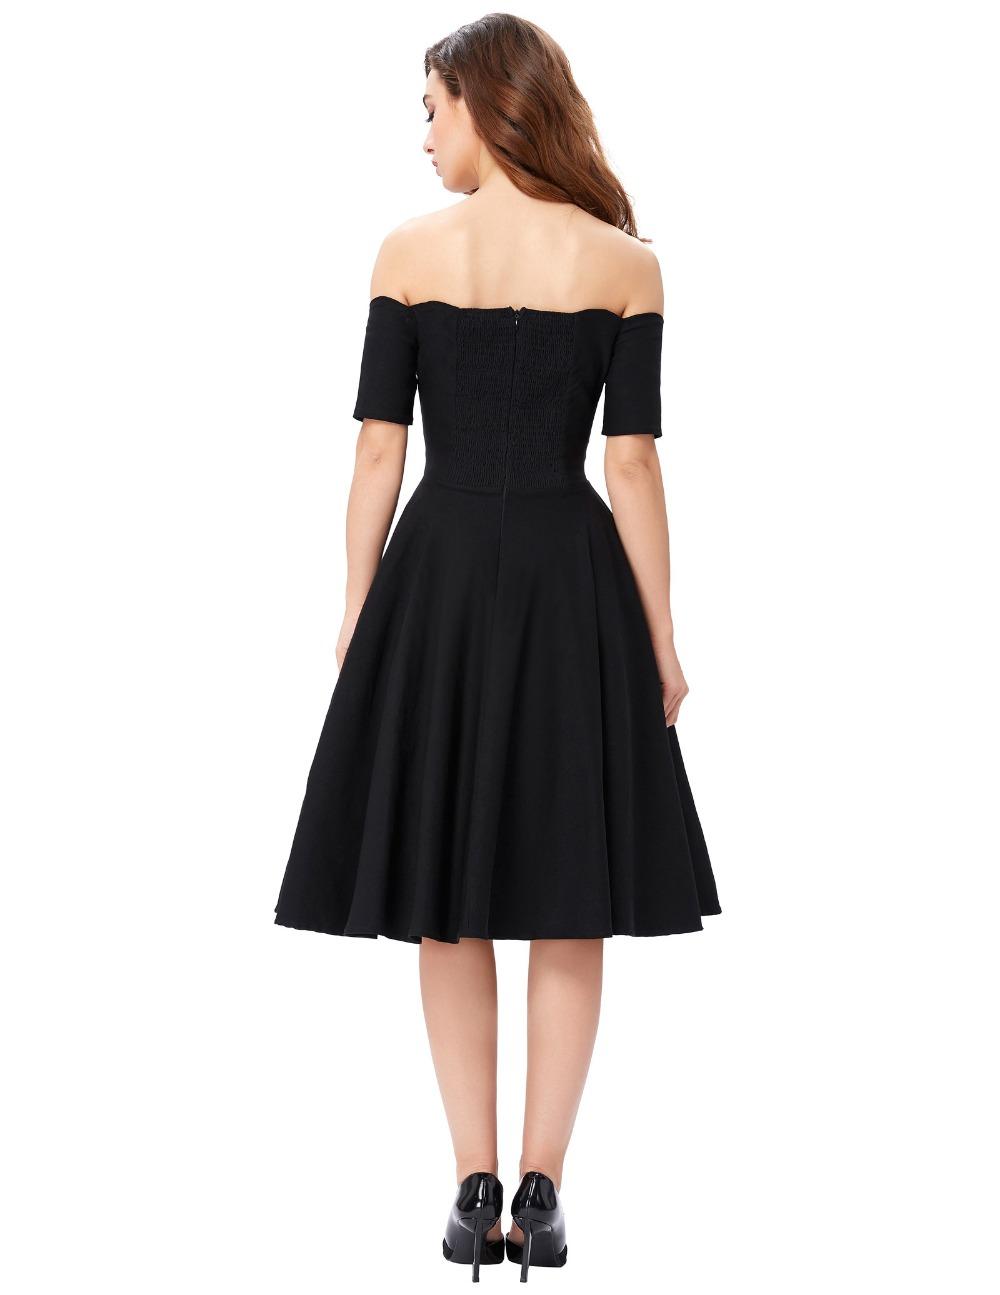 Belle Poque 17 Women Dress Robe Vintage Off Shoulder Black Summer Dress Jurken 1950s 60s Retro Rockabilly Swing Party Dresses 8